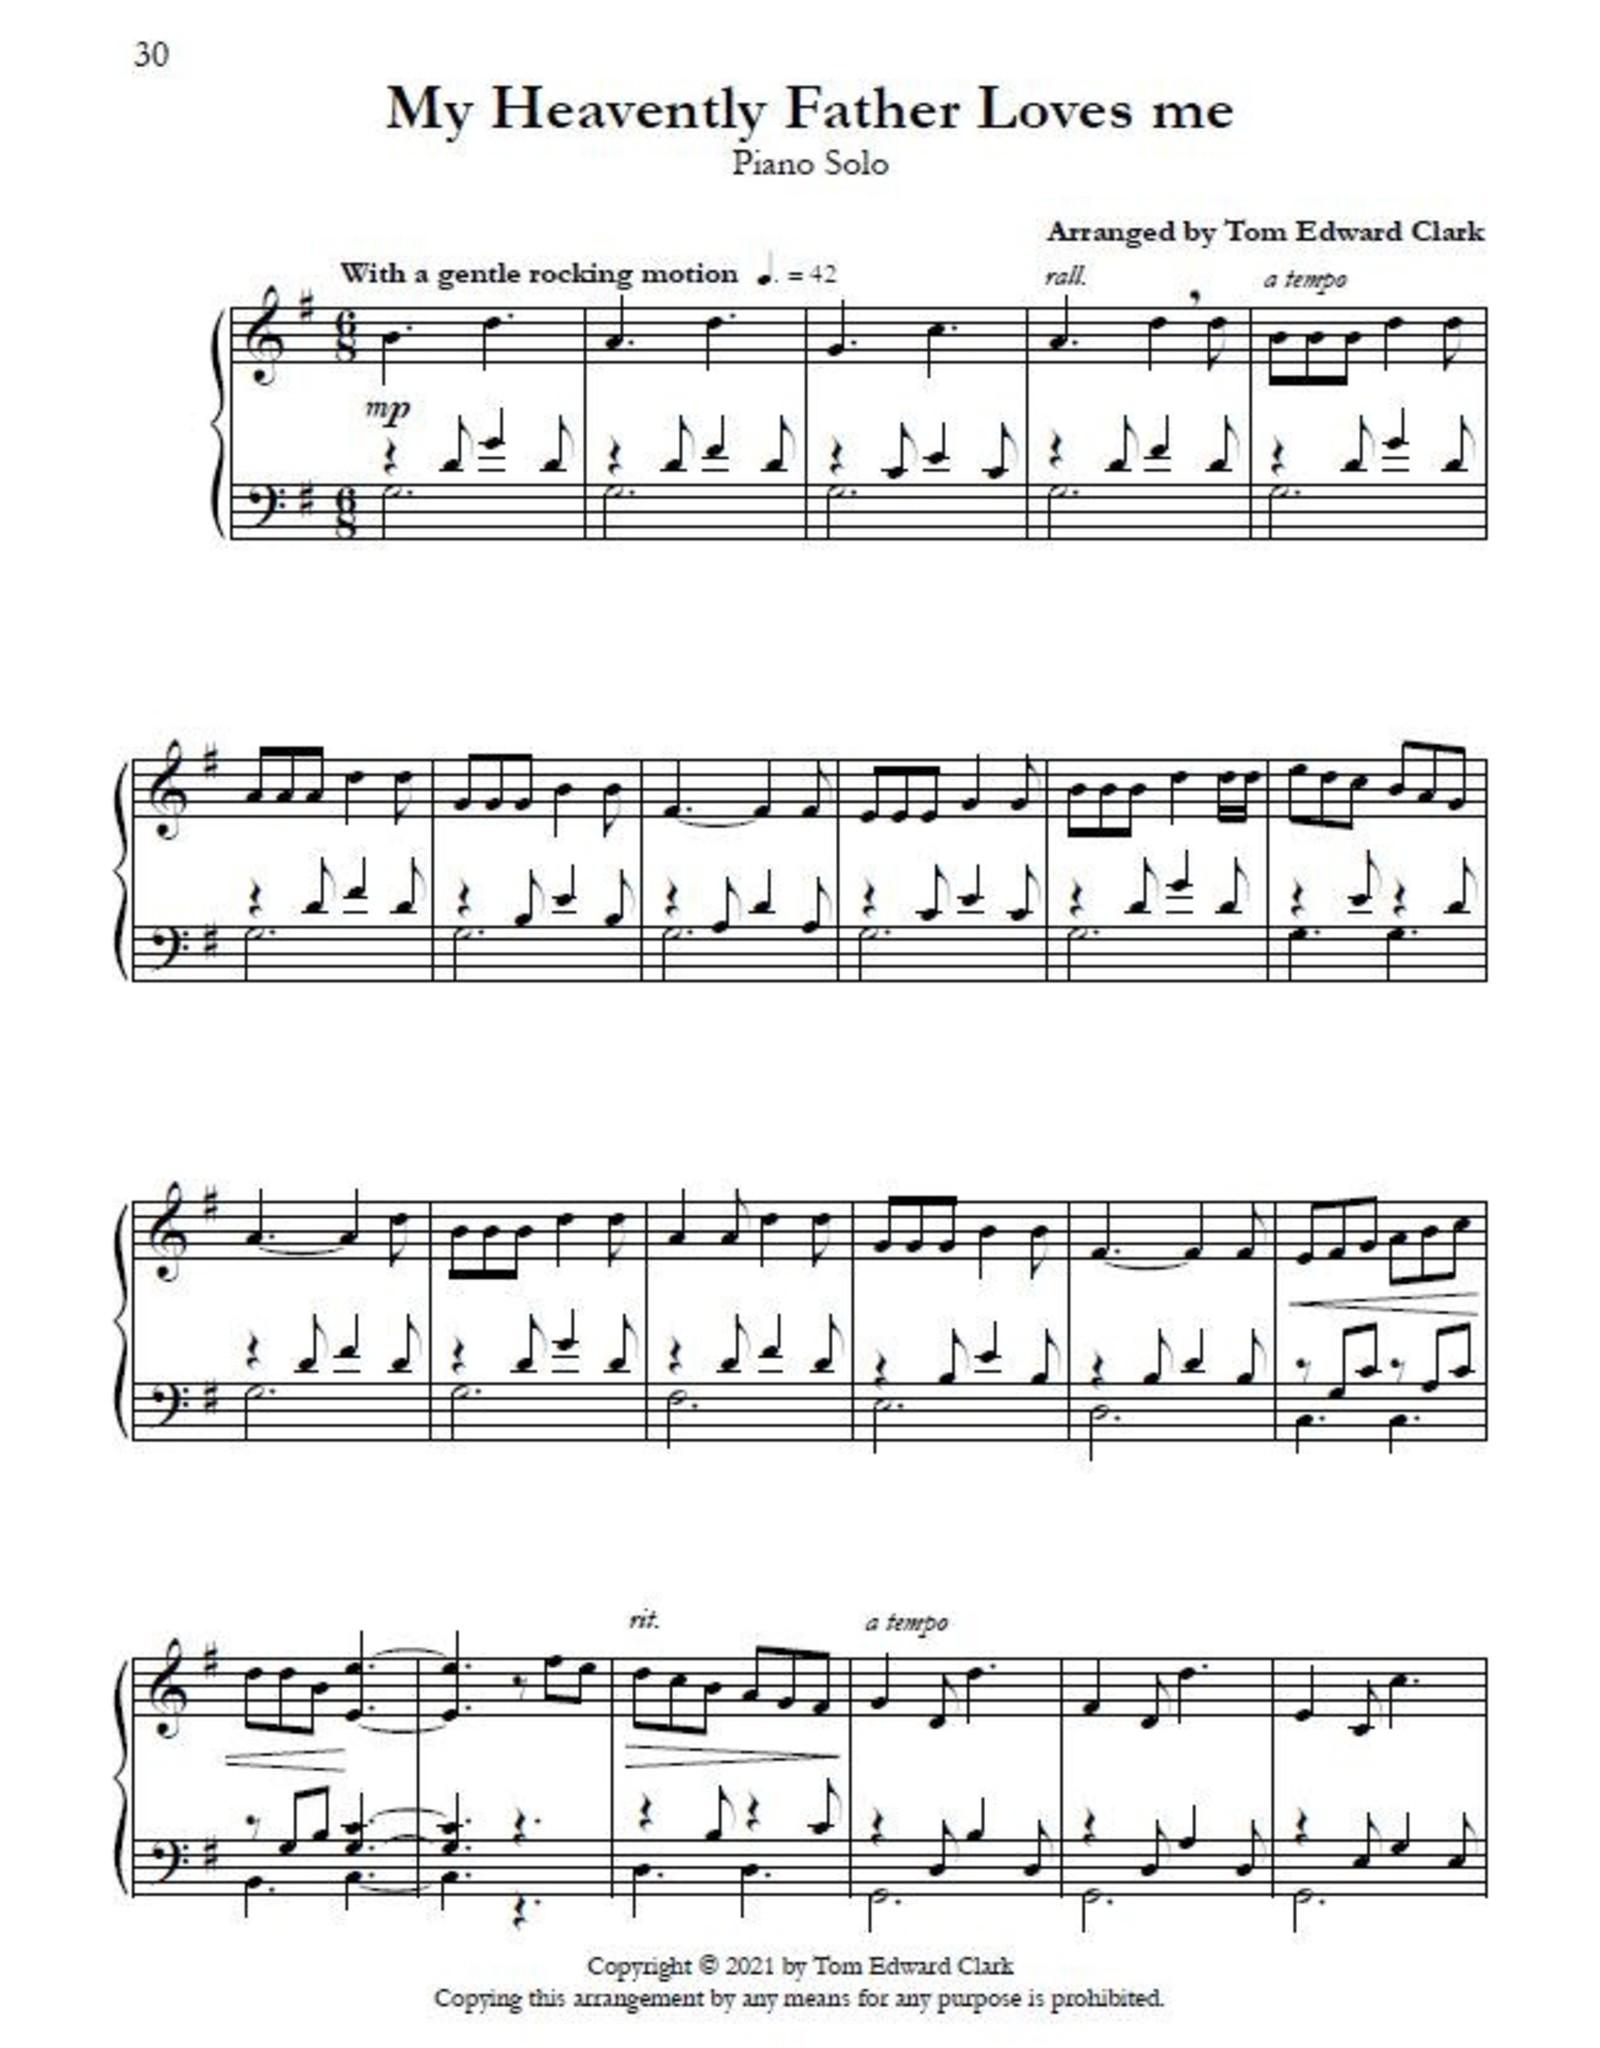 Tom Clark Music Faith - 14 LDS Piano Solos for the Intermediate Pianist by Tom Edward Clark